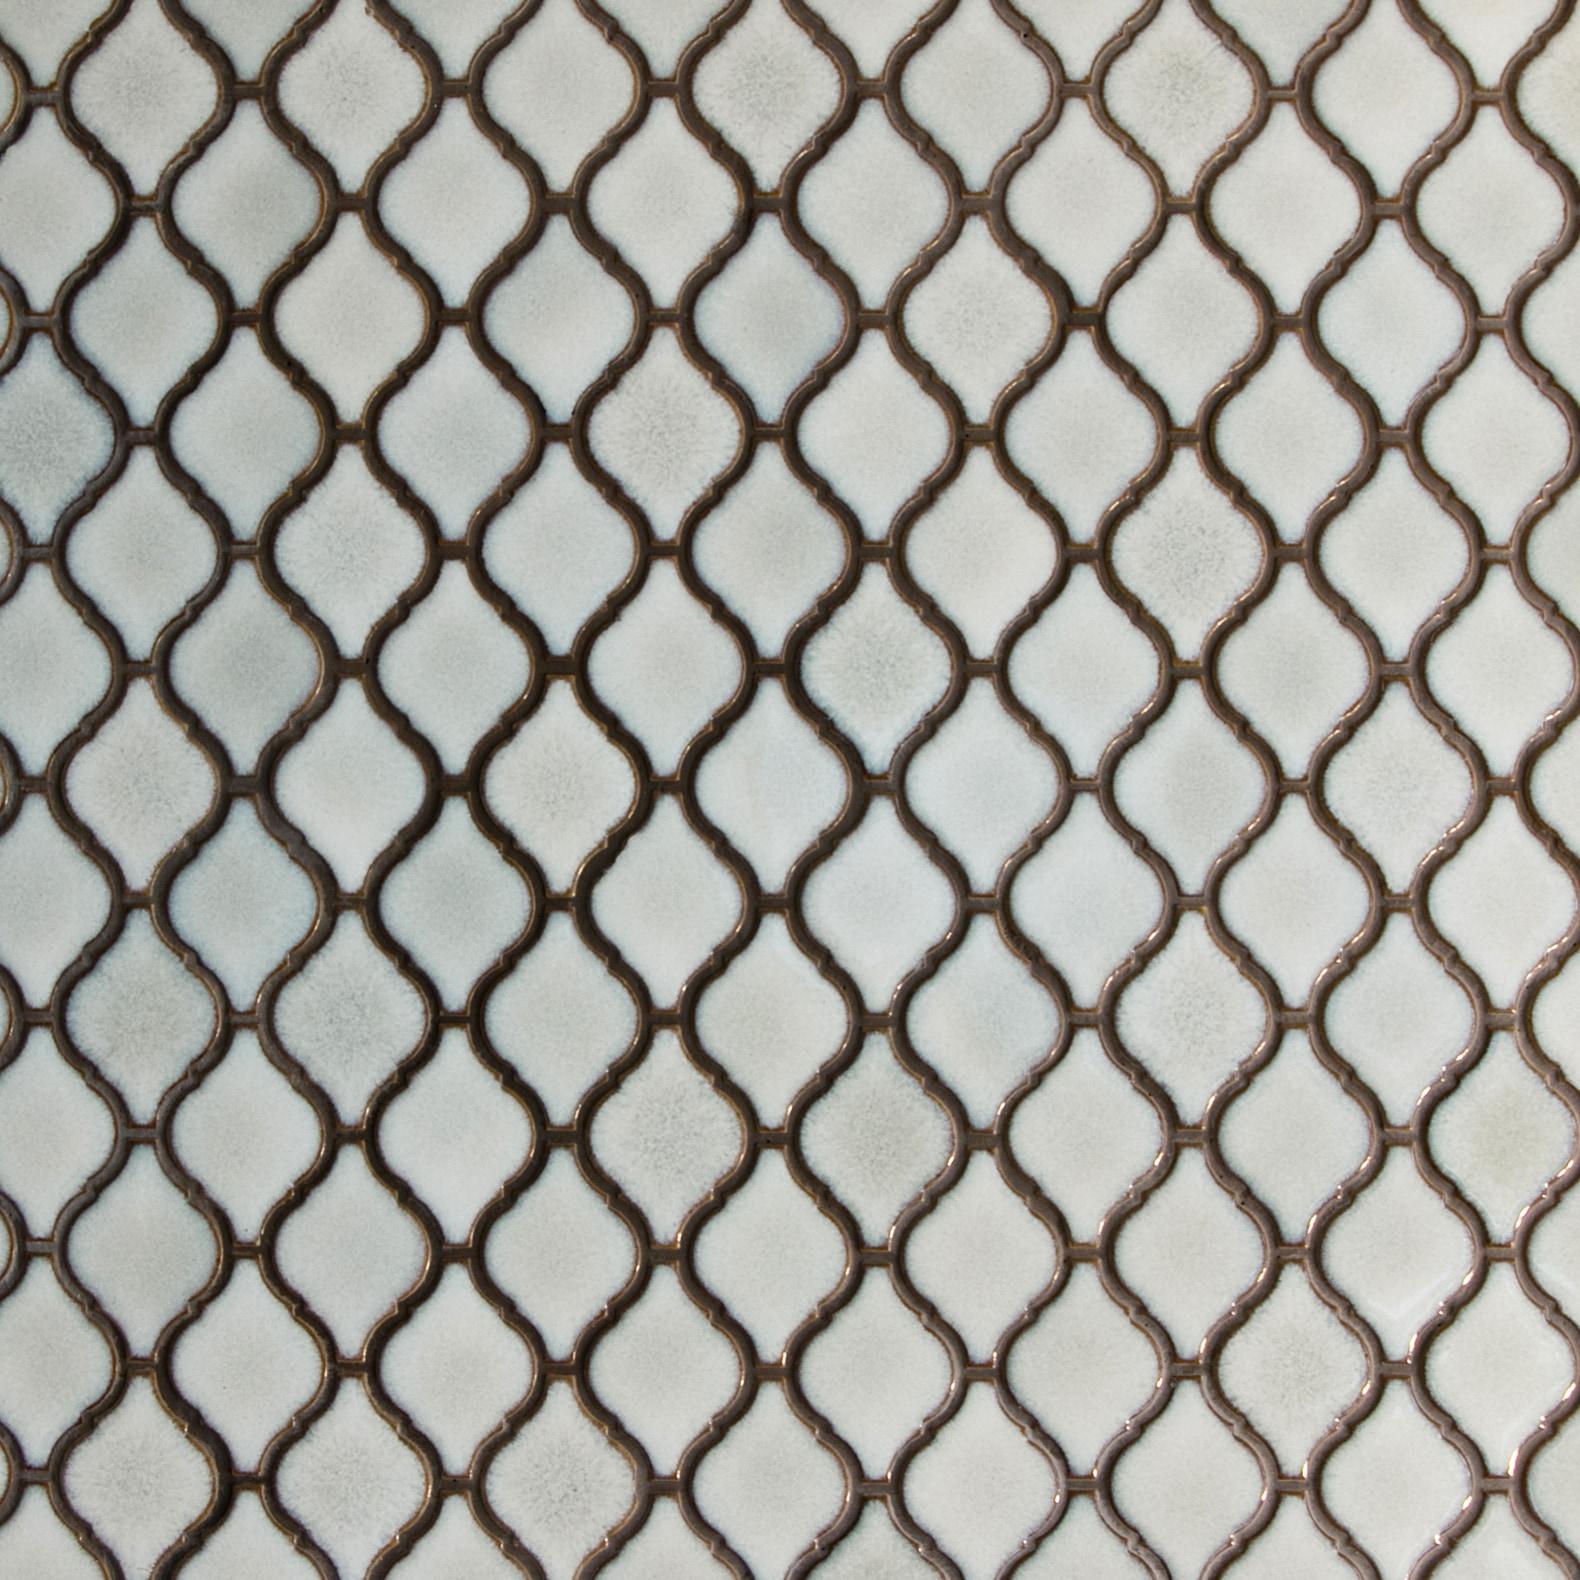 "Antique White, Narrow Pattern / 2.75""x2"" / Glossy Arabesque Lantern Mosaics 0"